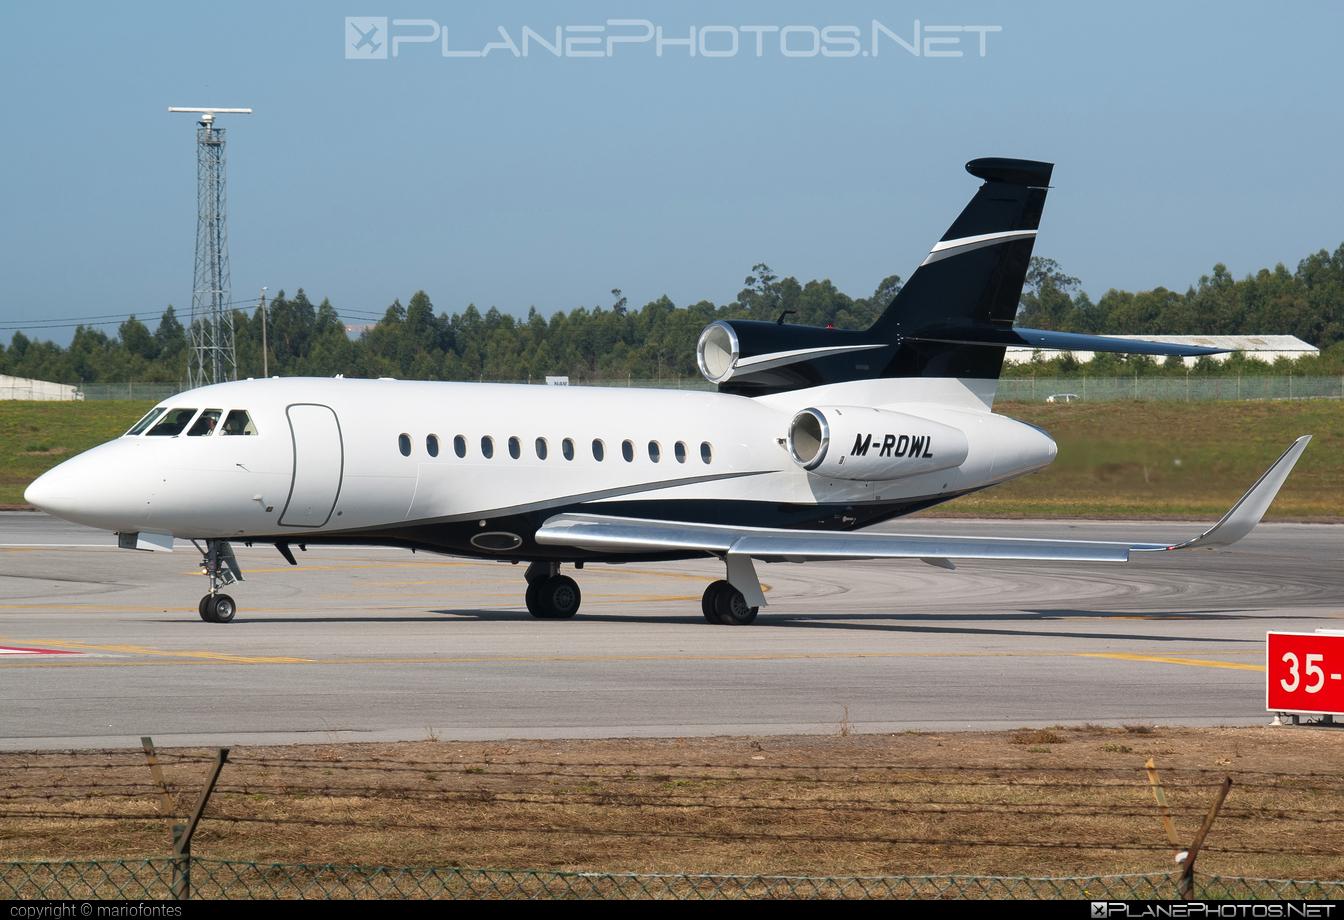 Dassault Falcon 900EX - M-ROWL operated by Private operator #dassault